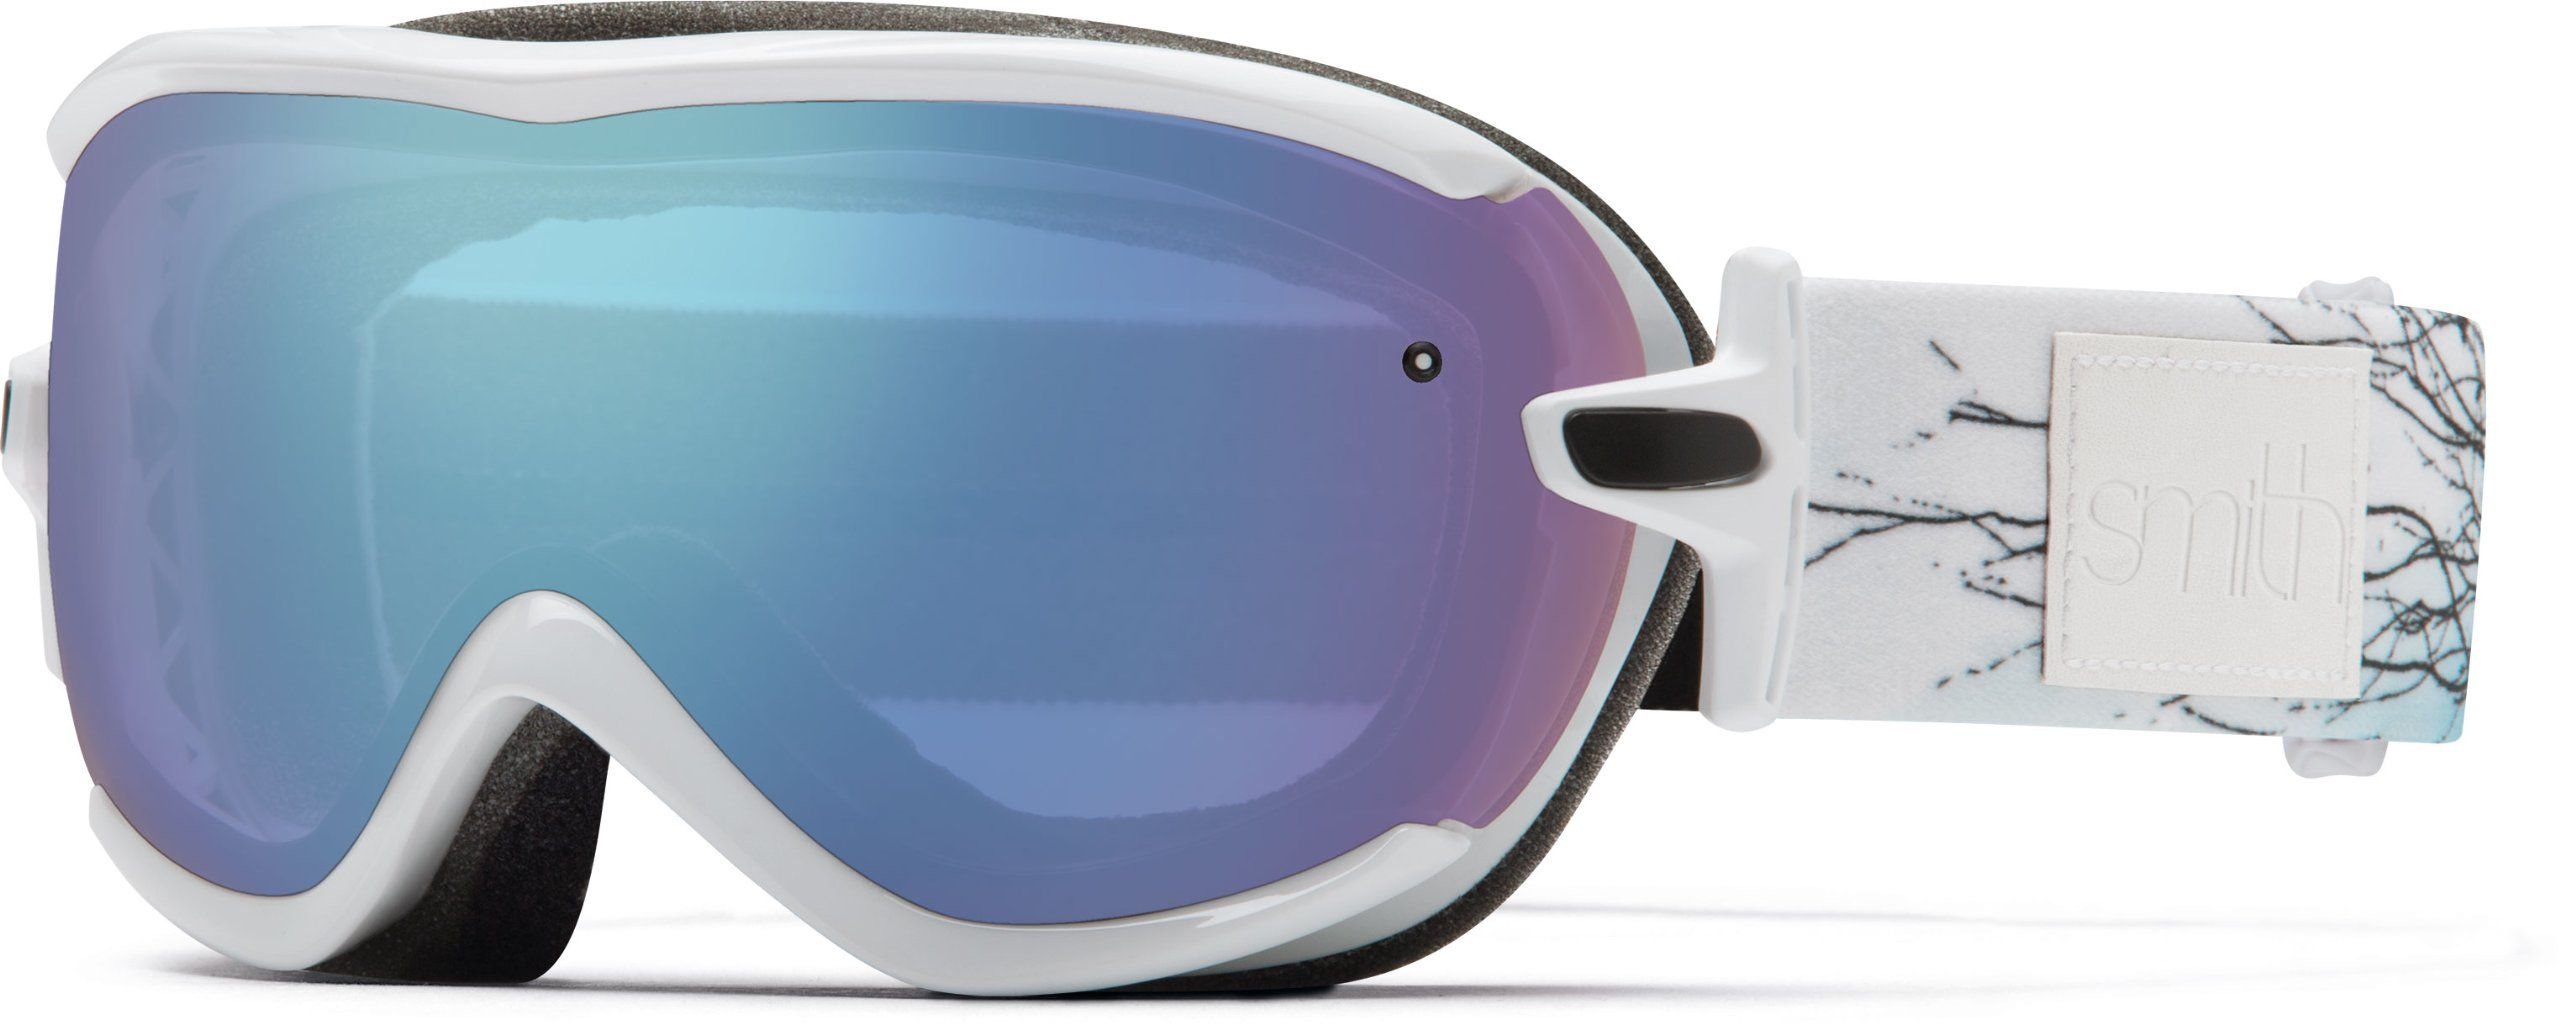 57d361c499d Amazon.com   Smith Optics SO-VR6 Women s Virtue Snow Goggles-(White ...